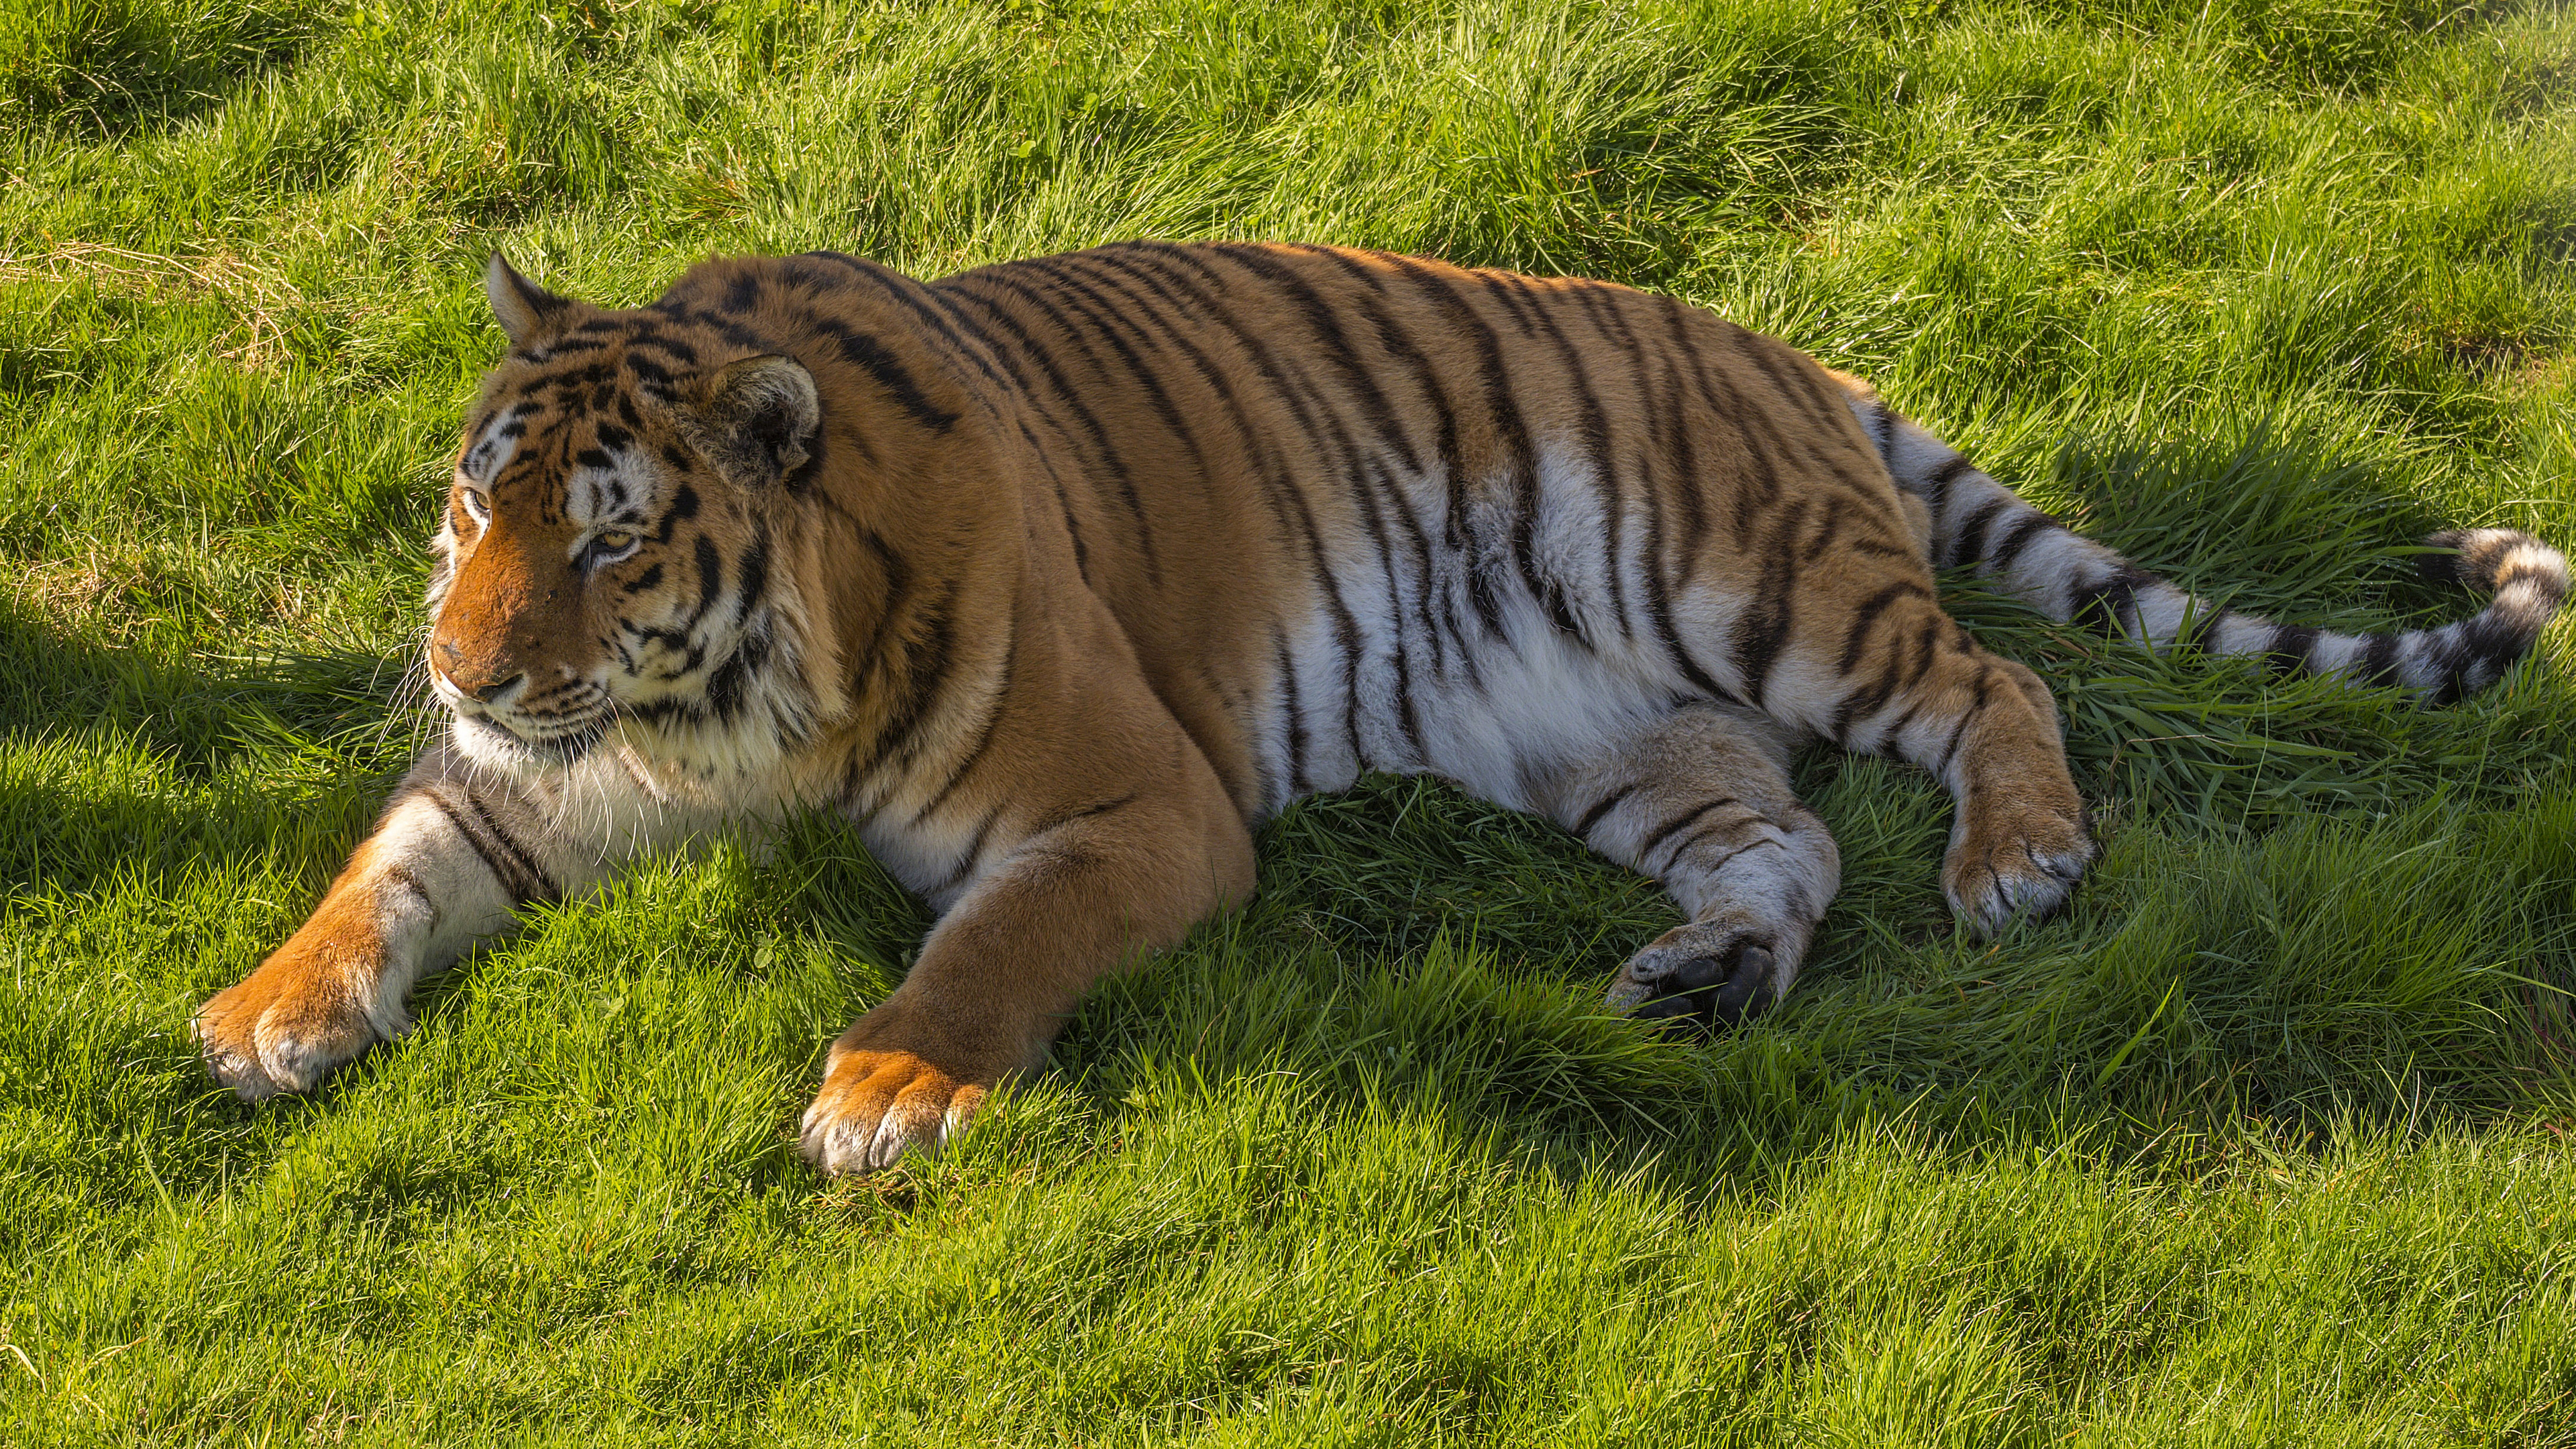 Амурский тигр в лучах солнца на траве